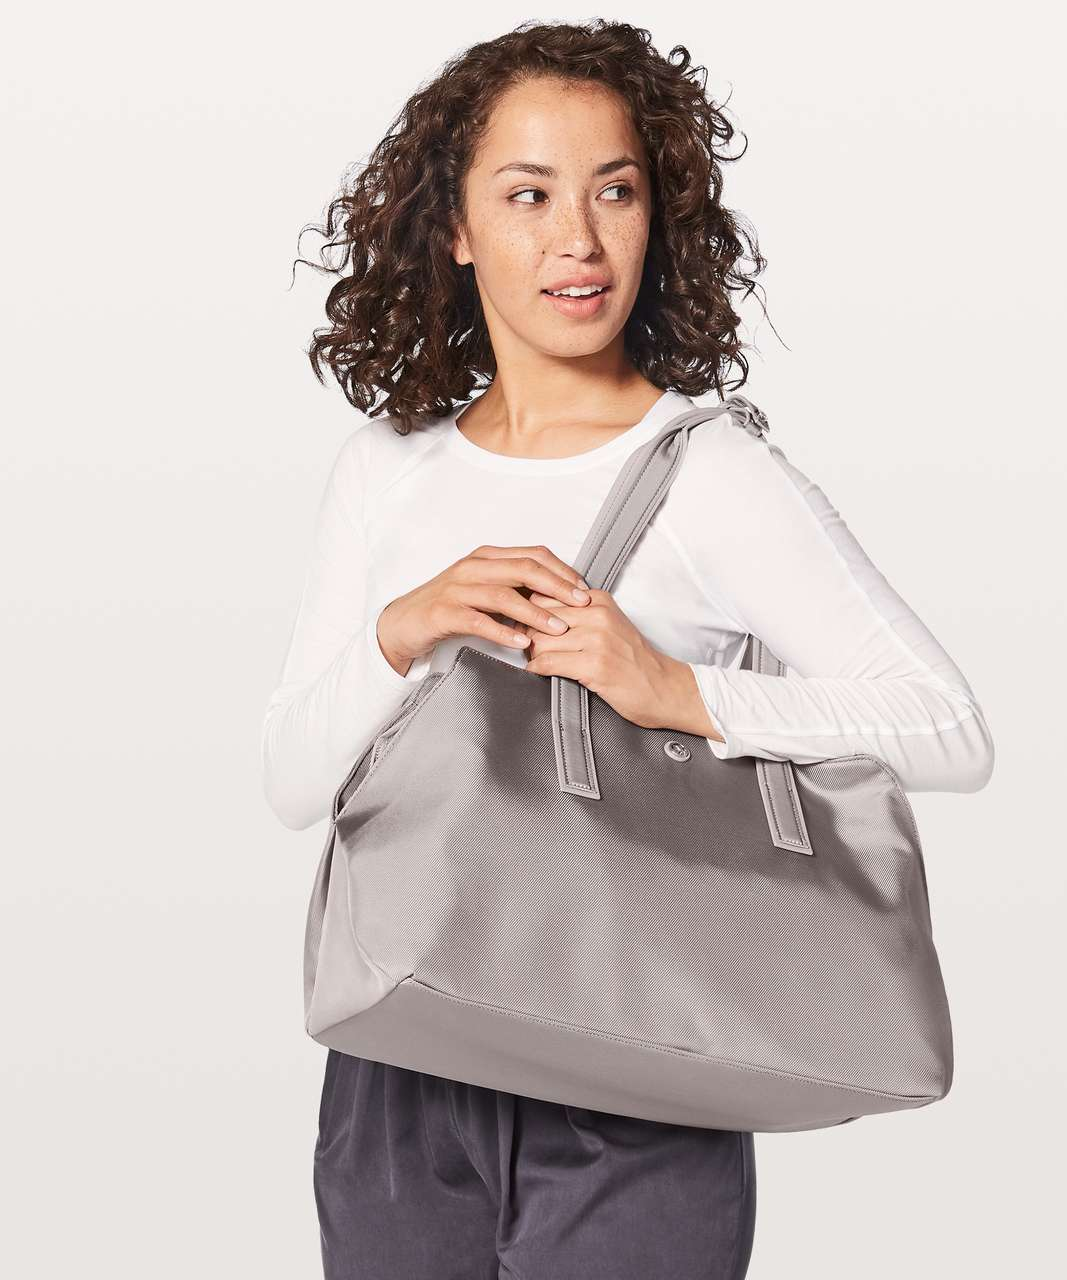 Lululemon Go Getter Bag *Heatproof Pocket 26L - Dark Chrome